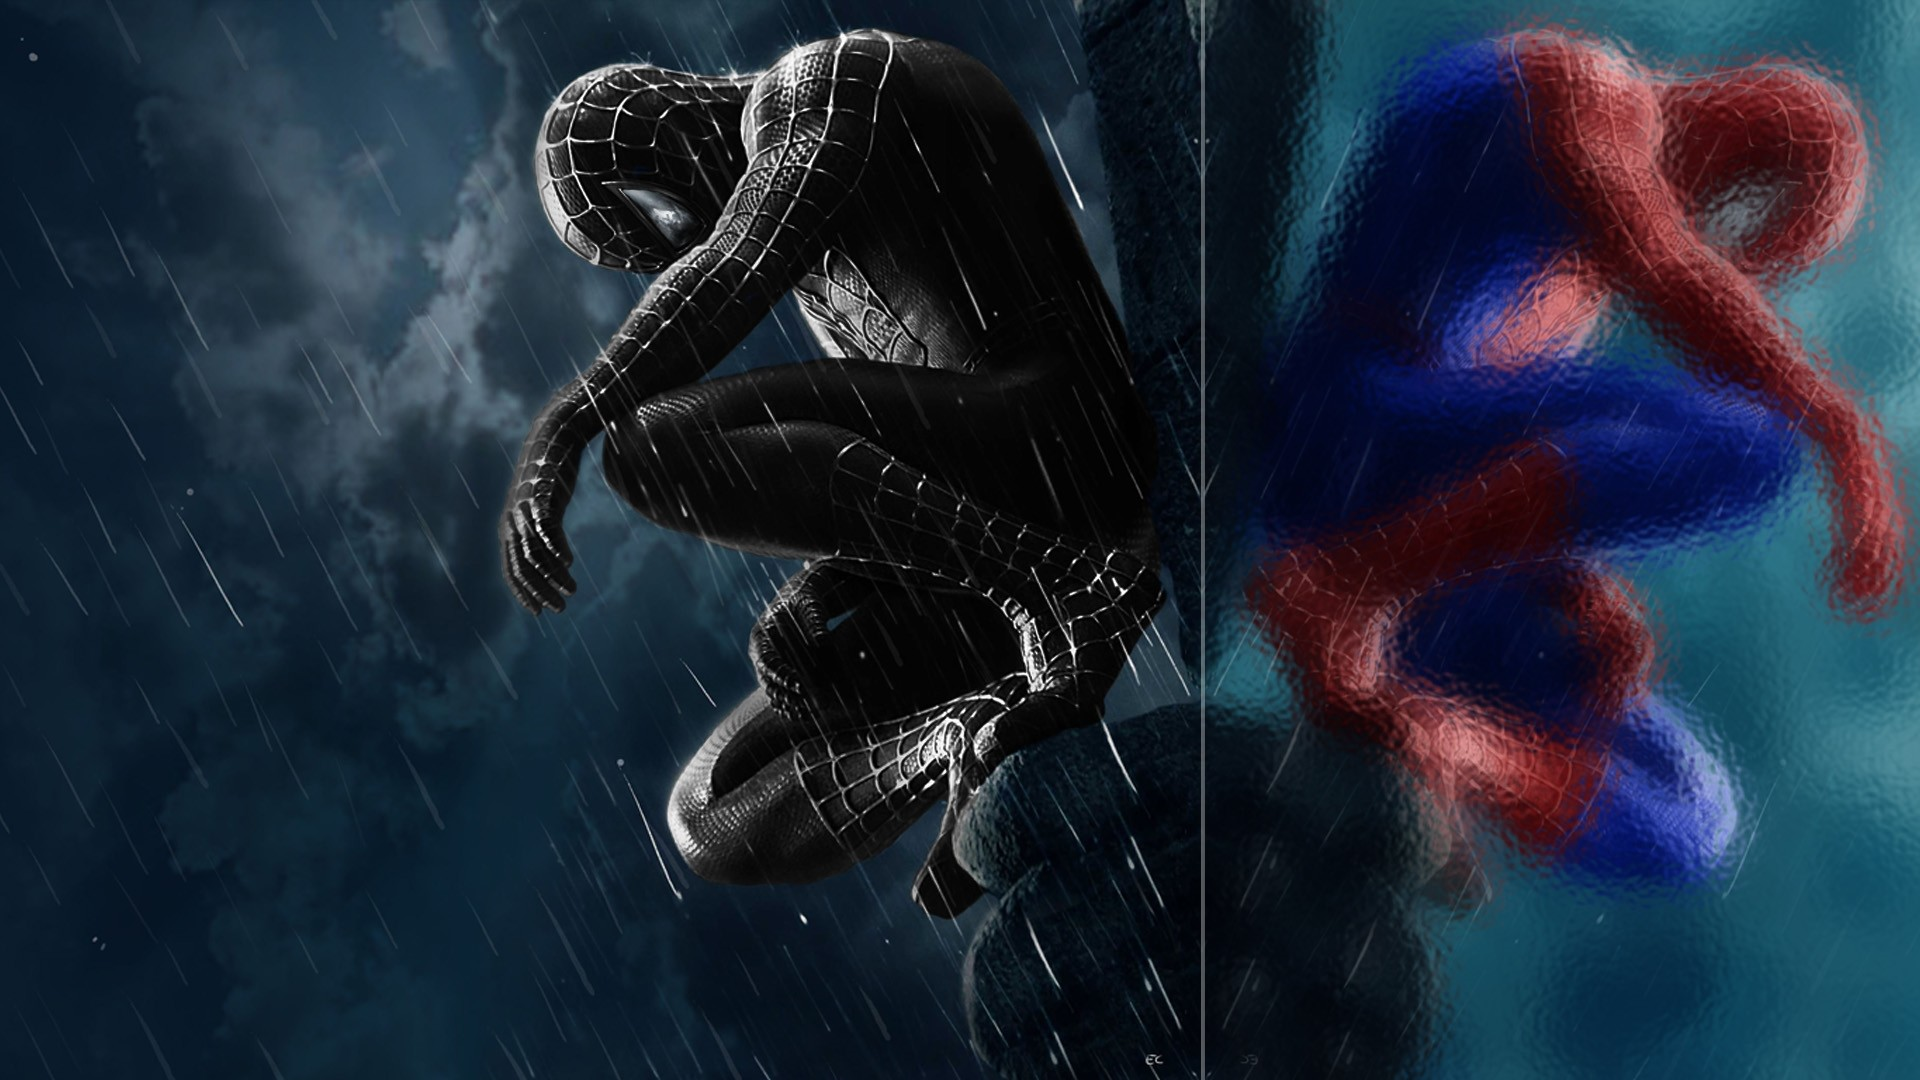 HD Spider Man Desktop Wallpapers (67+ images)